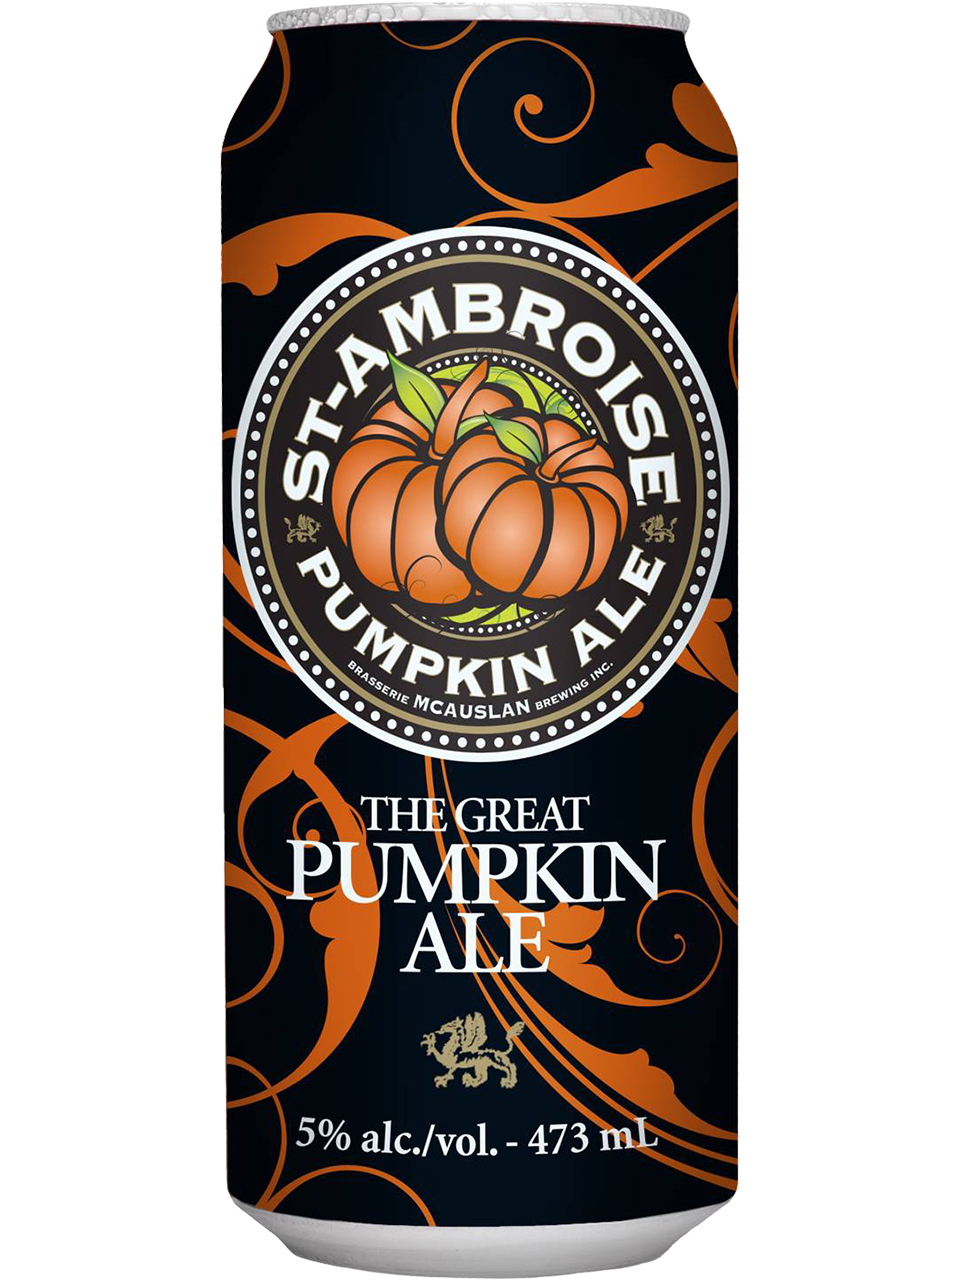 St.Ambroise Pumpkin Ale 473ml Can